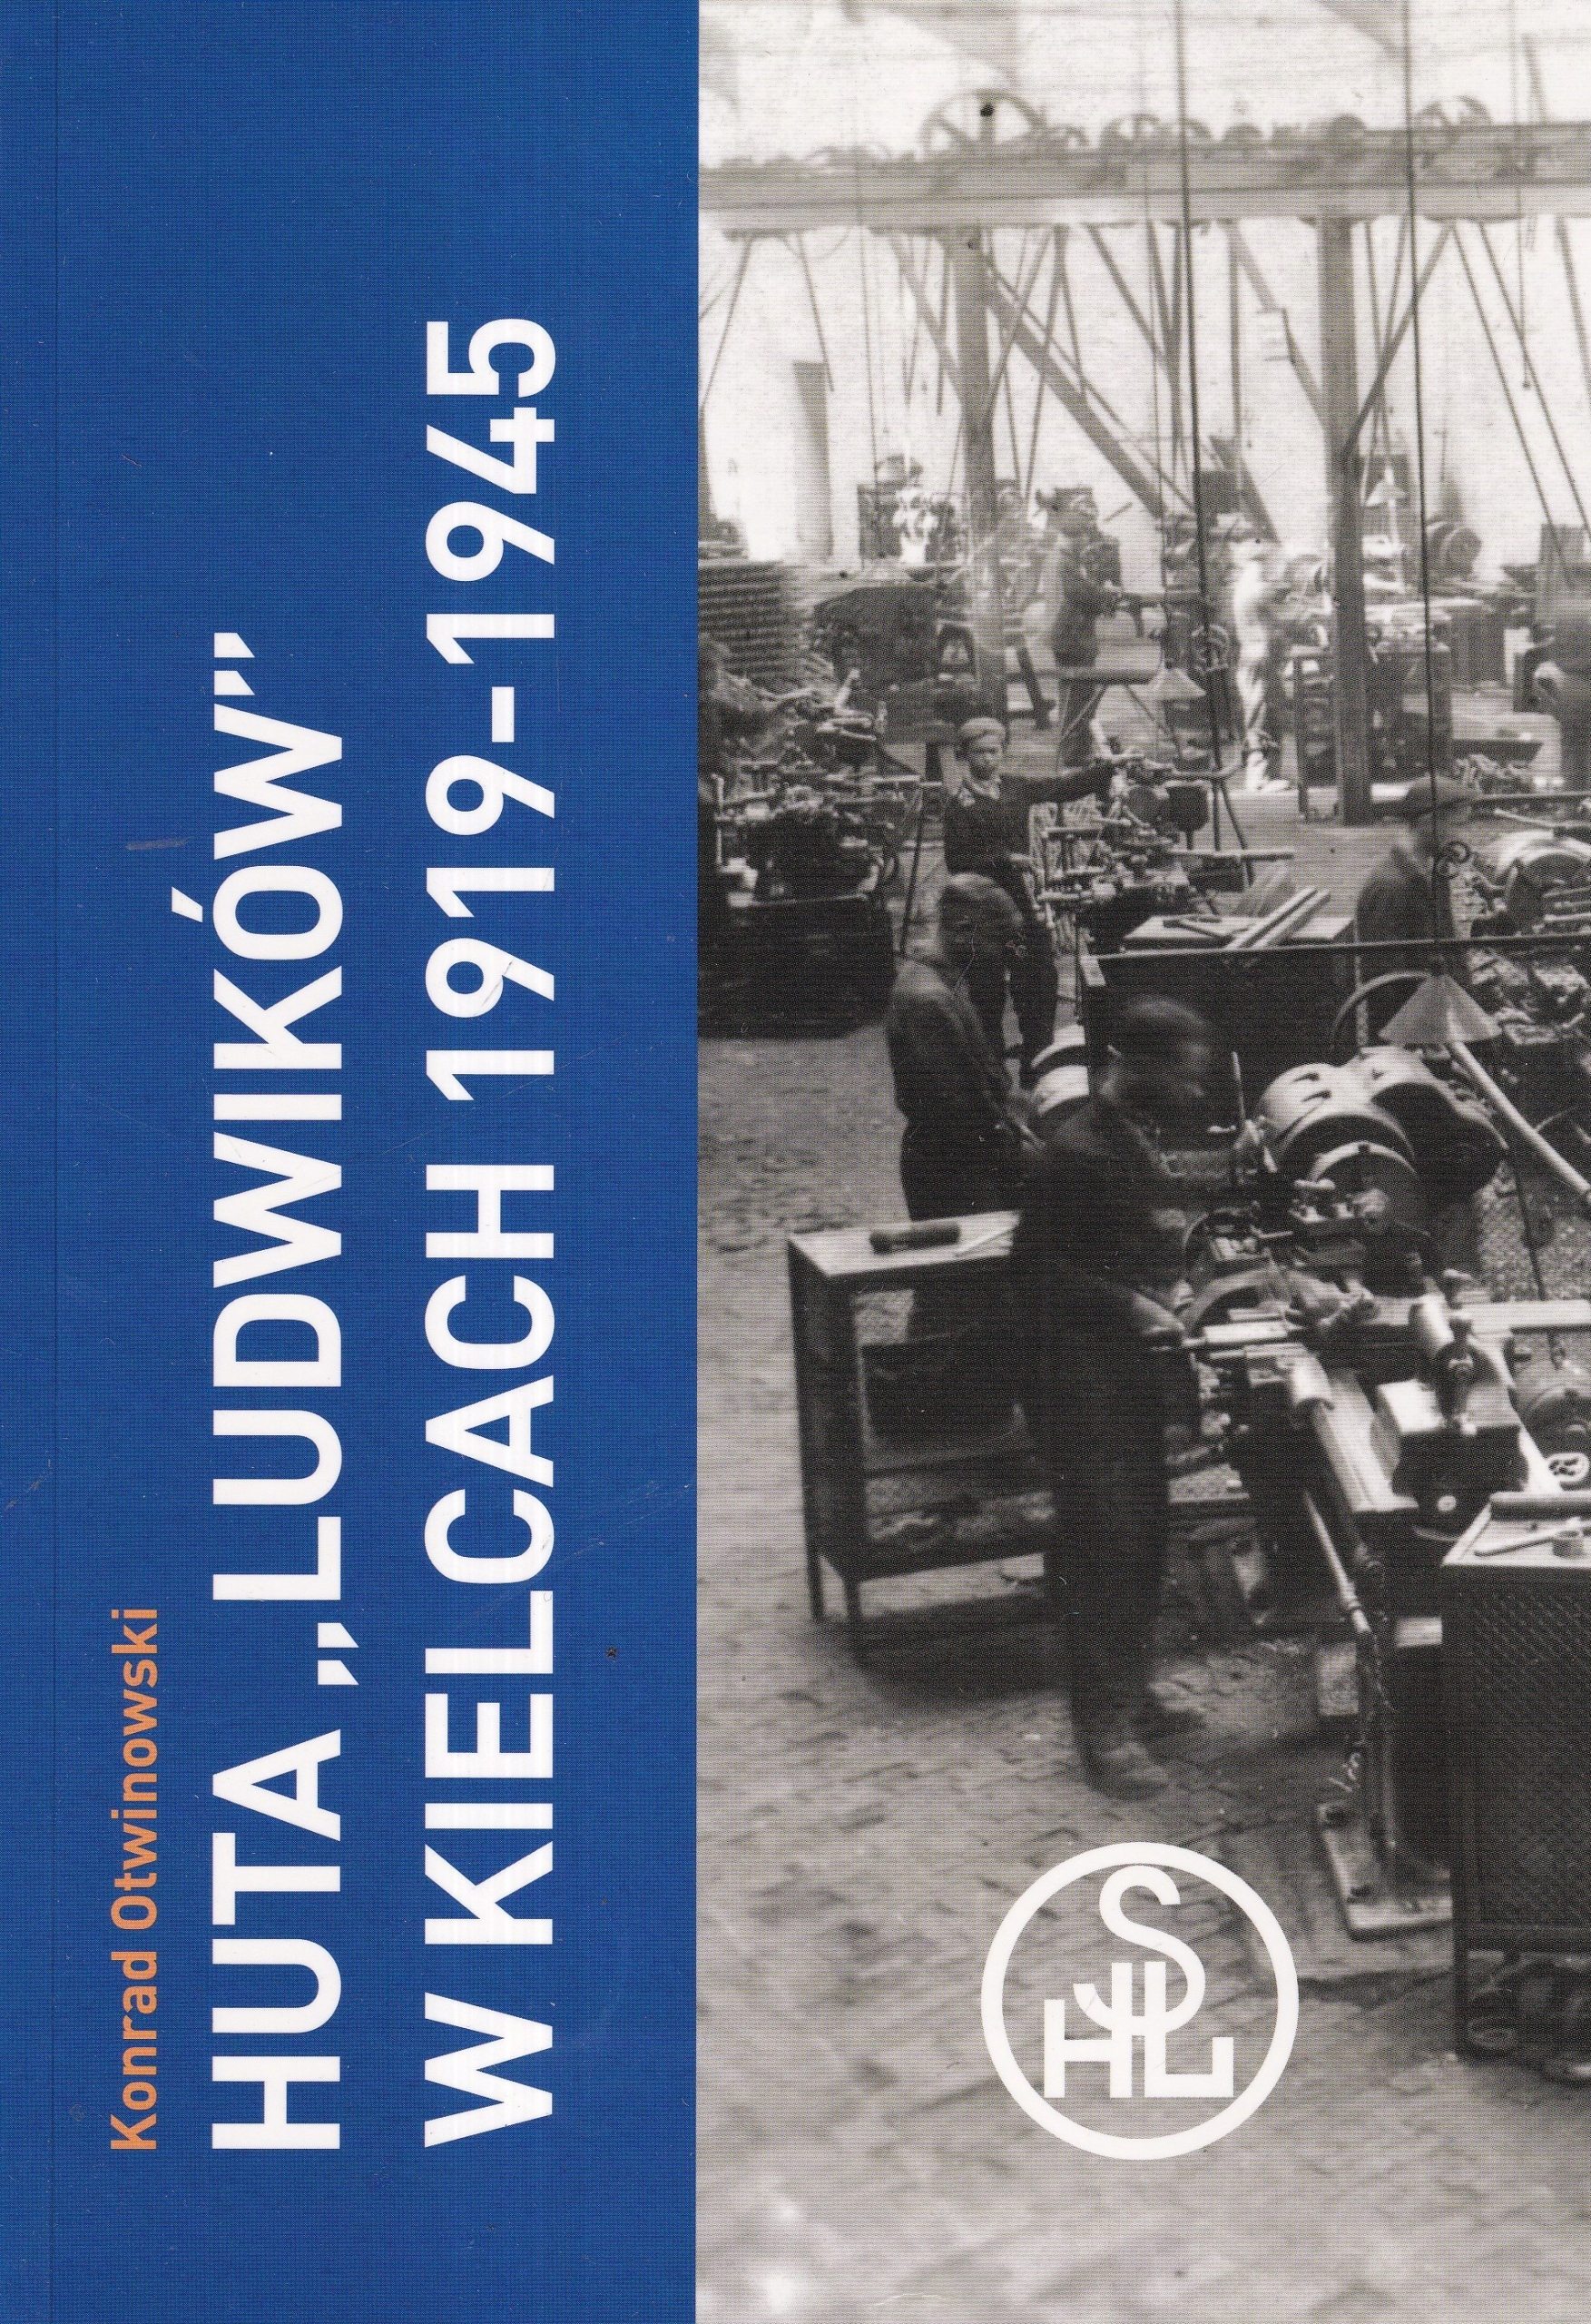 Huta Ludwików История 1919-1945 гг.